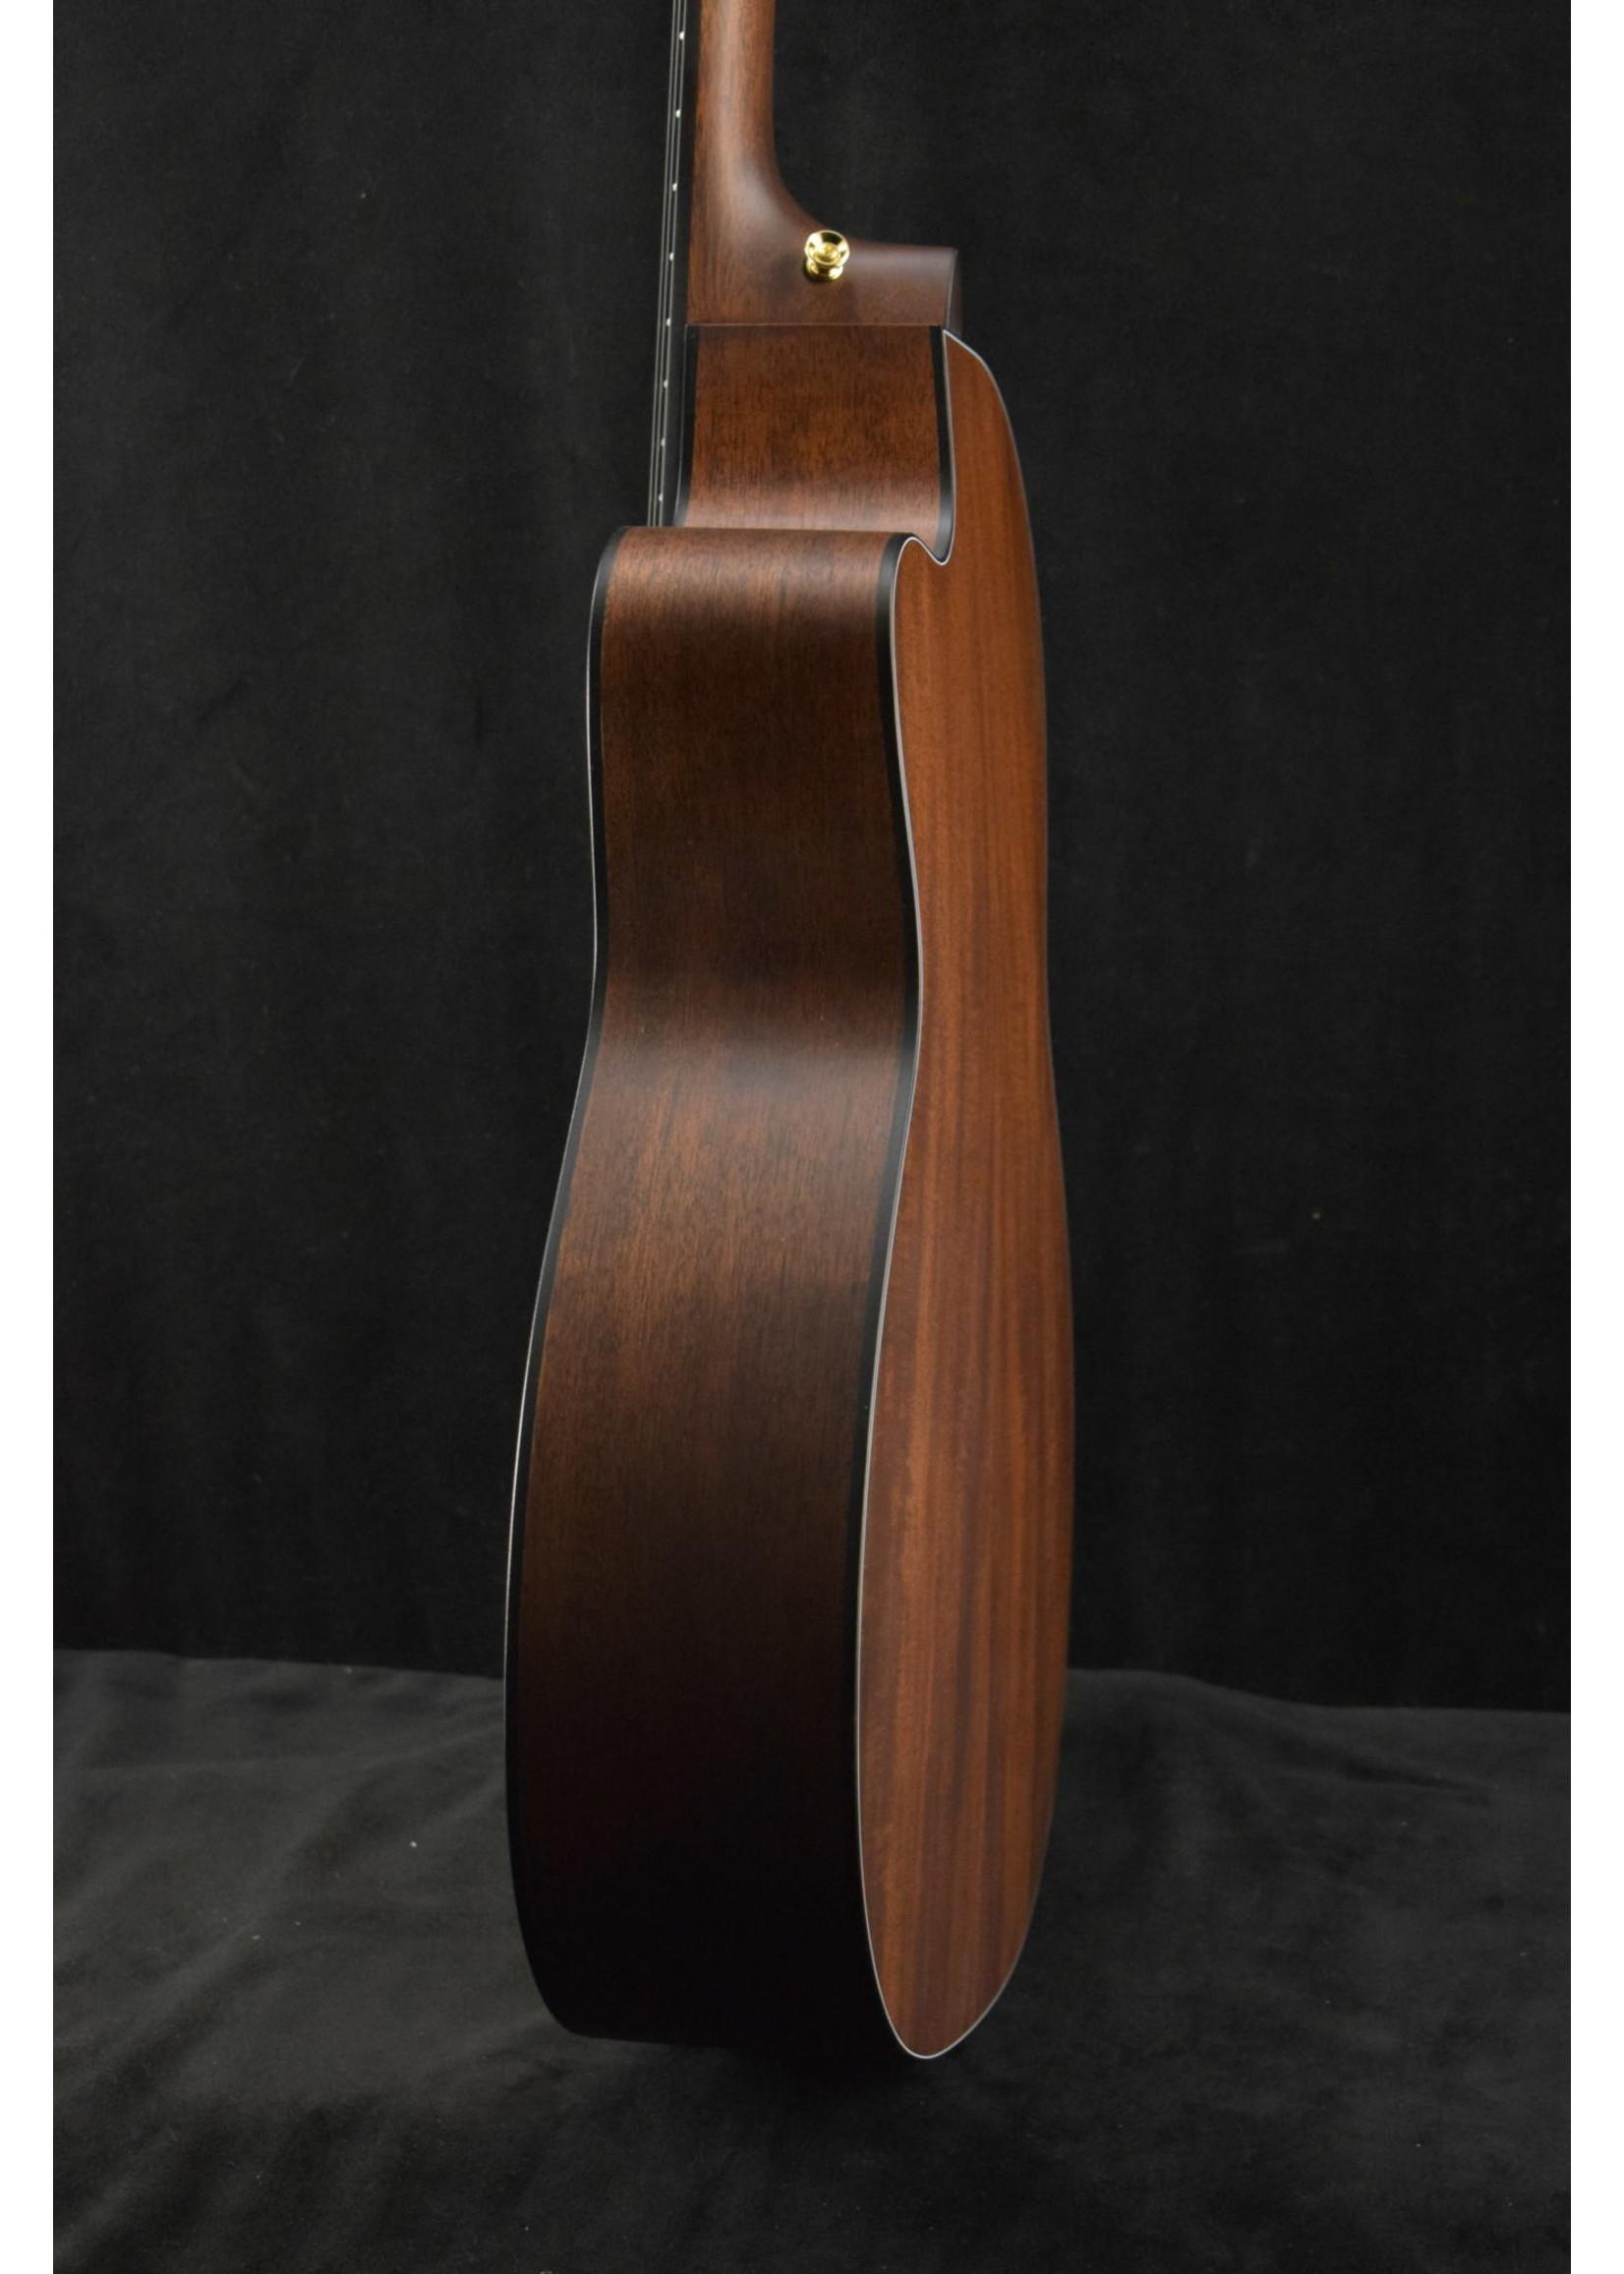 Martin Martin 000C12-16E Nylon-String Acoustic/Electric Natural